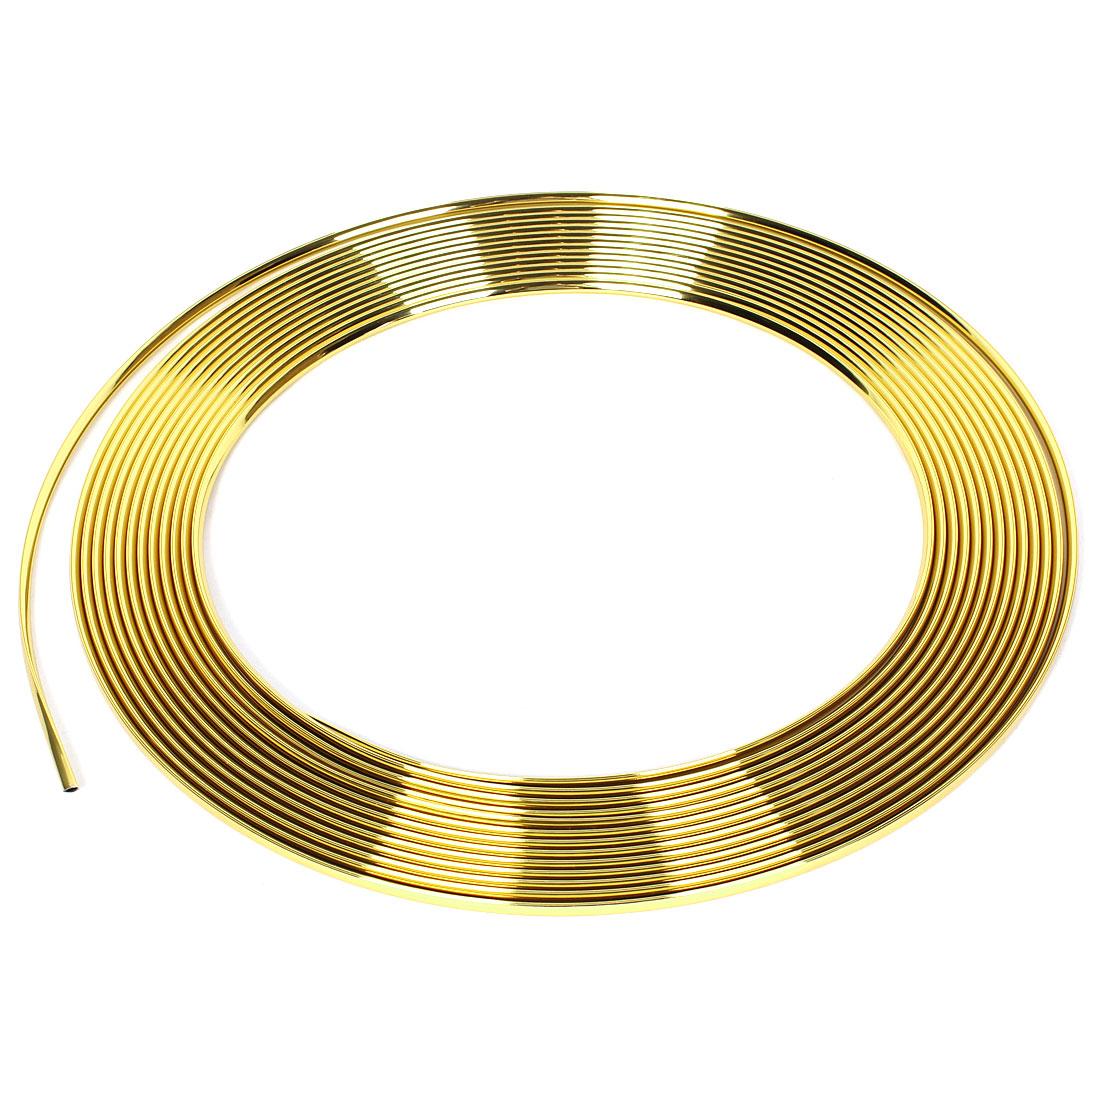 Car Decoration 15M x 6mm Gold Tone Plastic Moulding Trim Strip Adhesive Tape